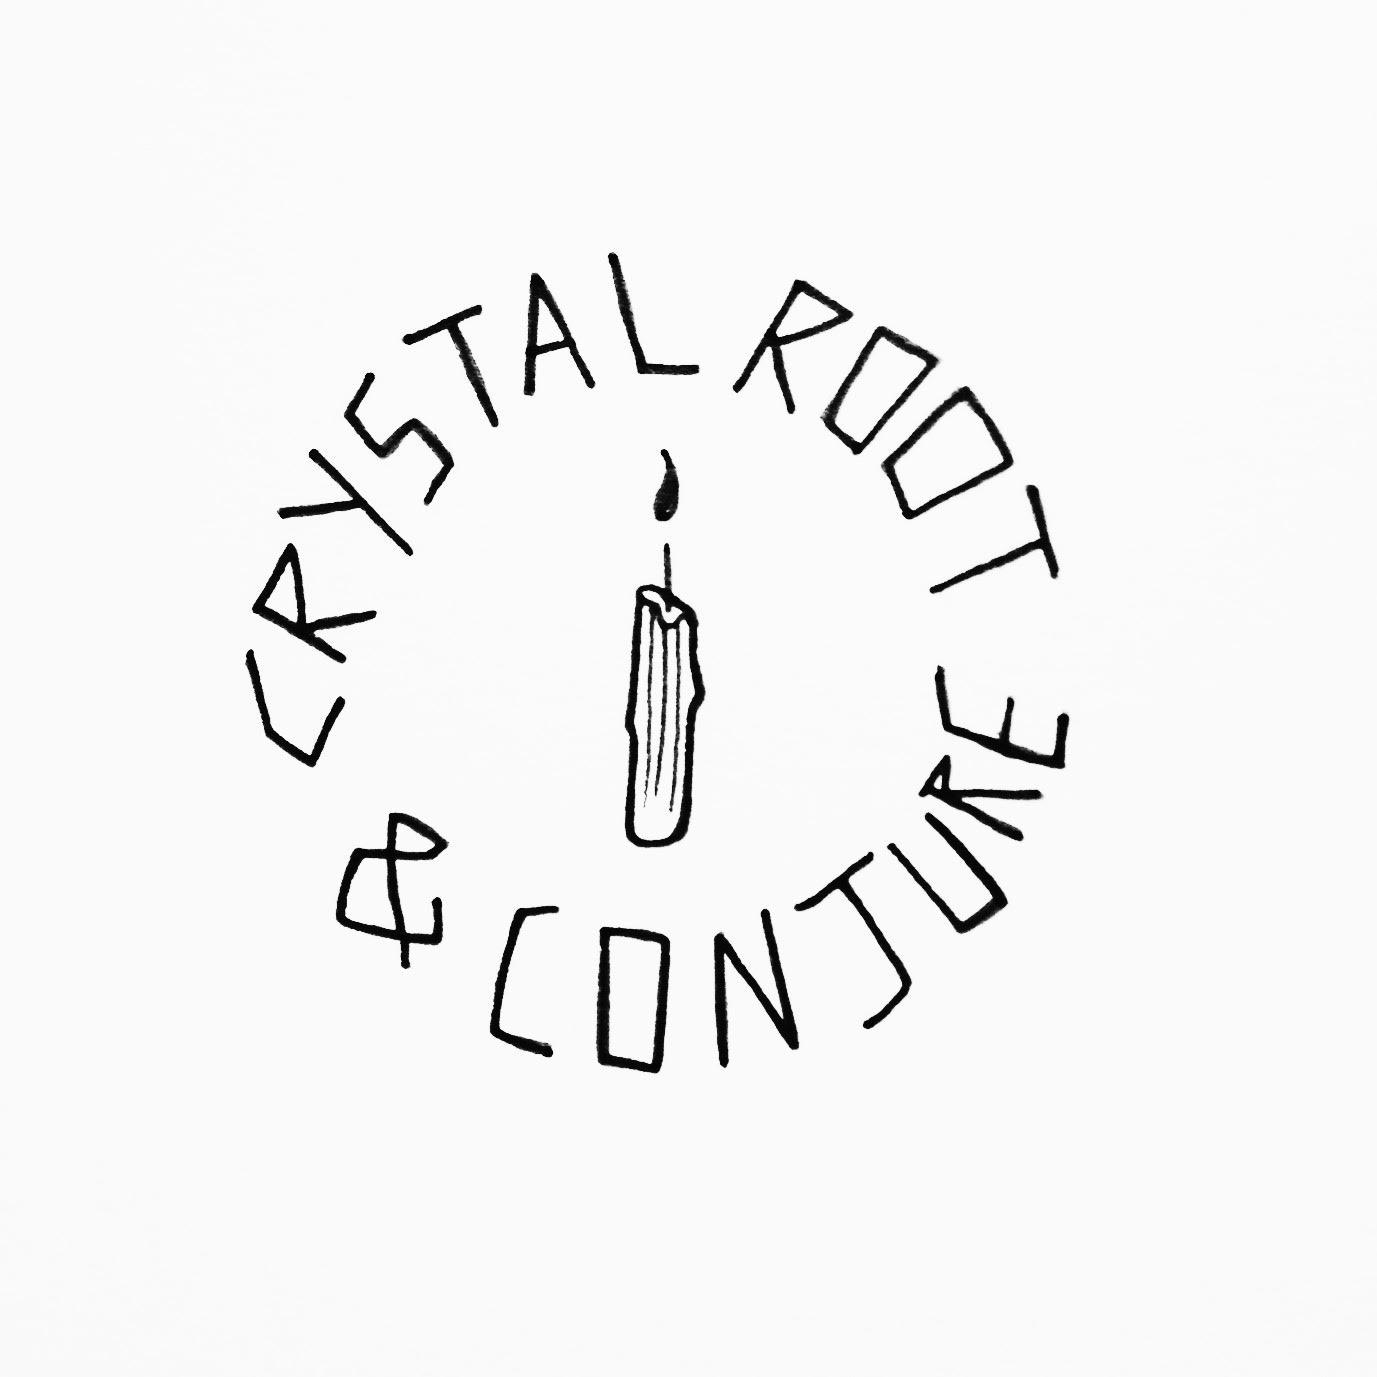 CrystalRootandConjureLogo.jpg